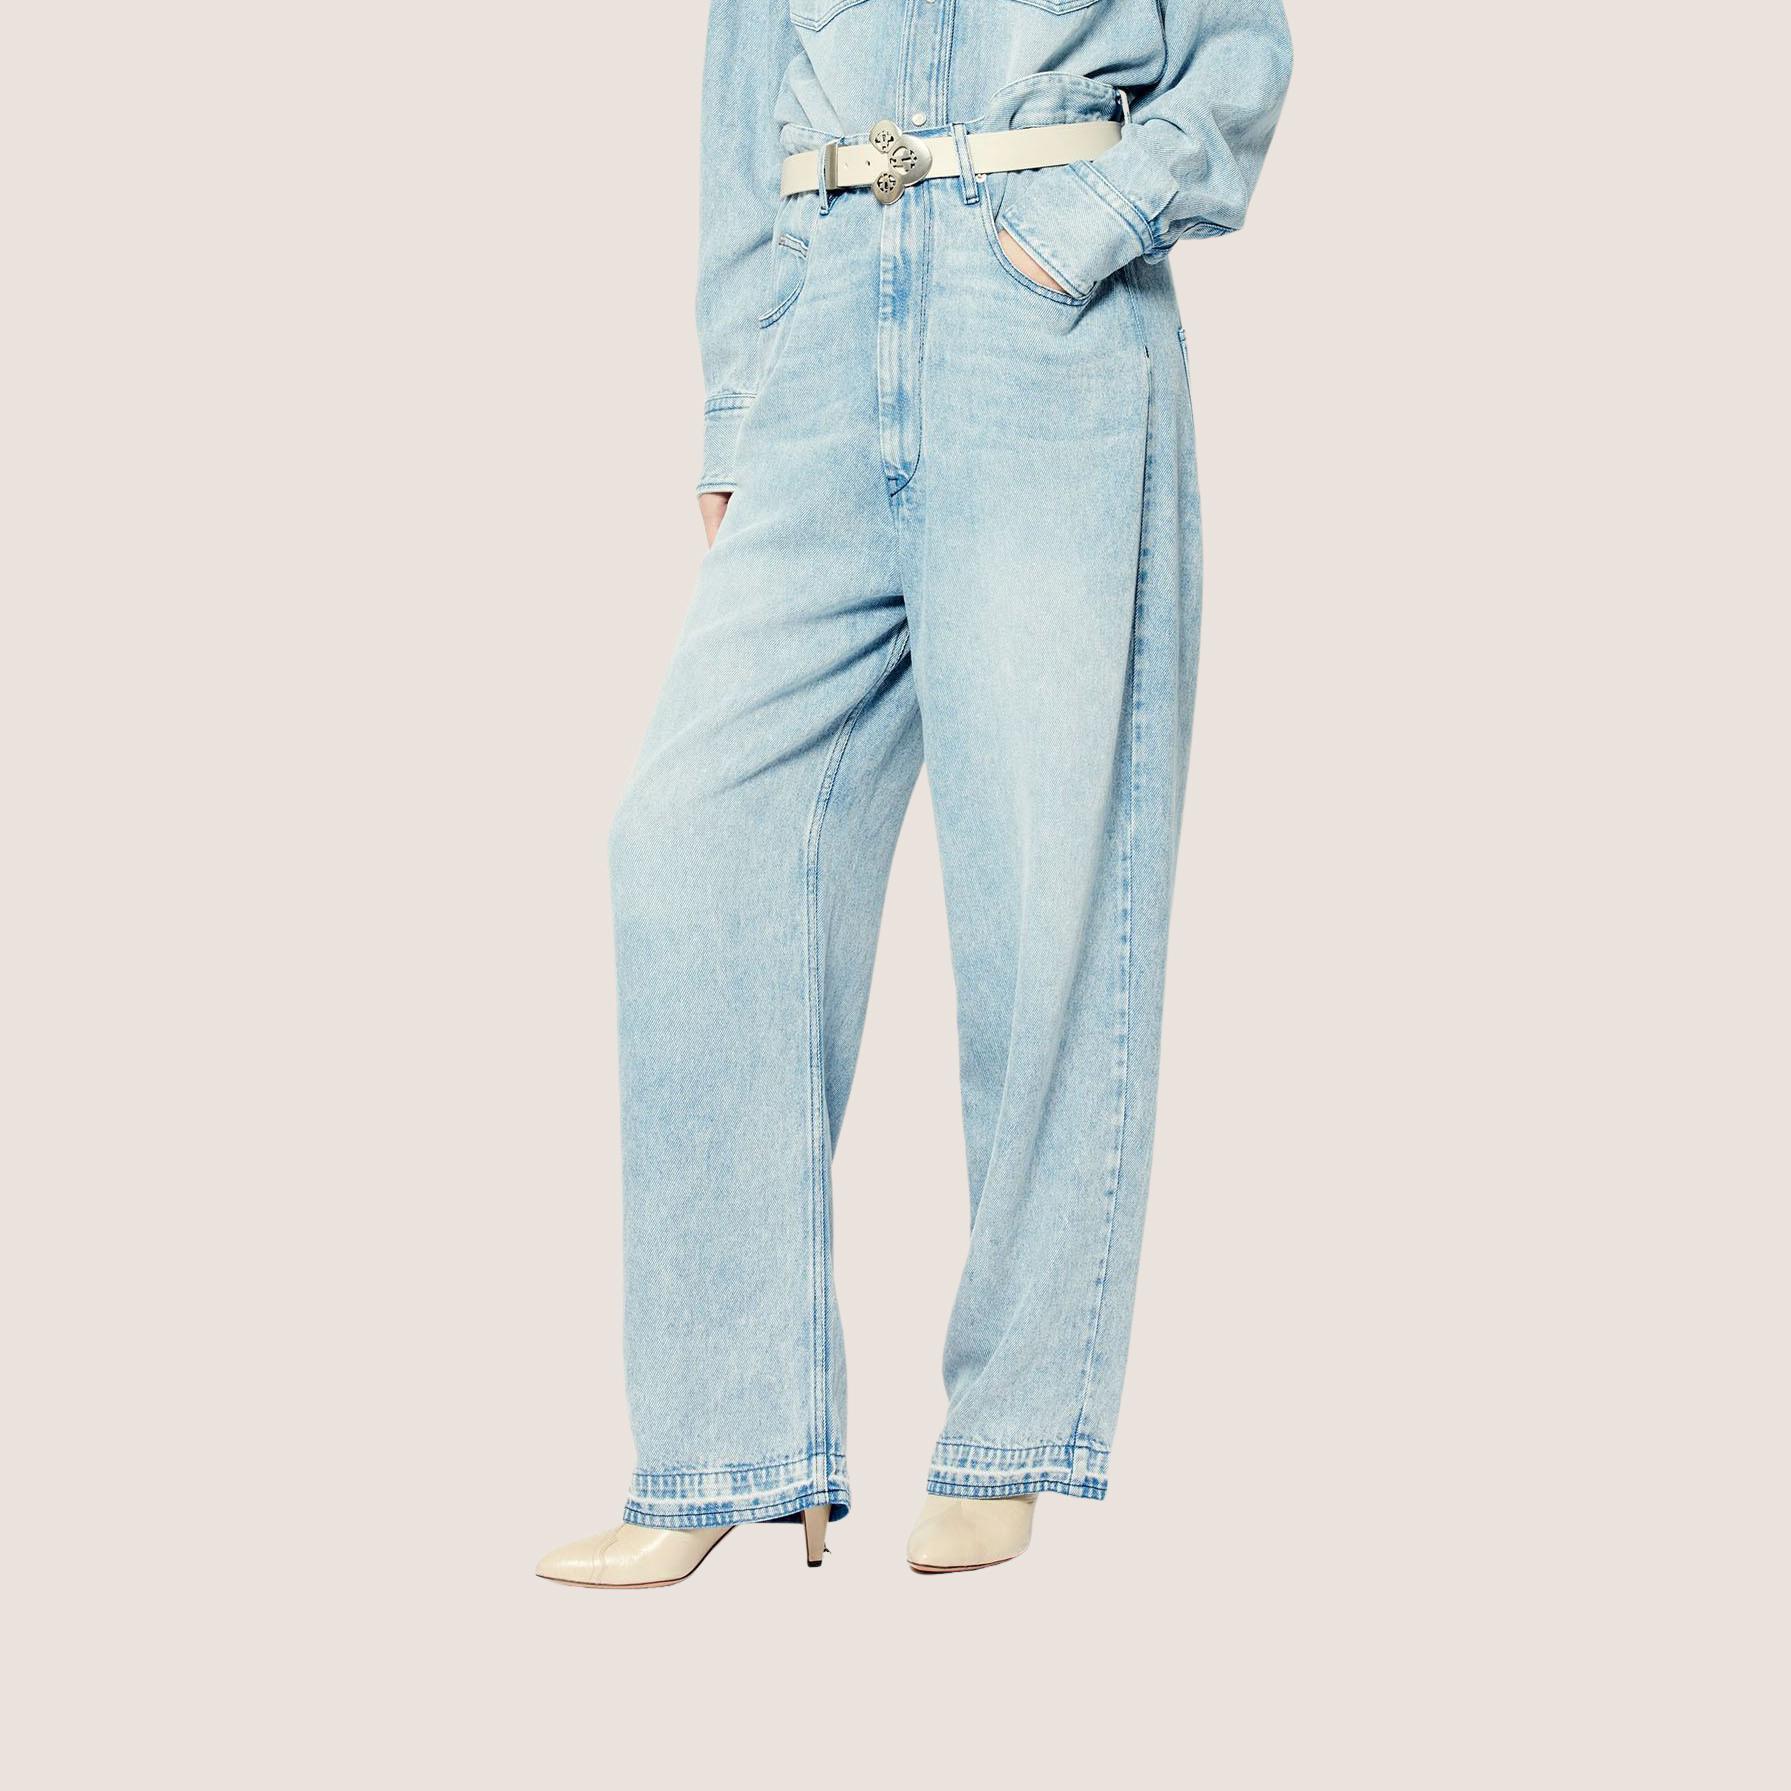 Tilorsy Pants